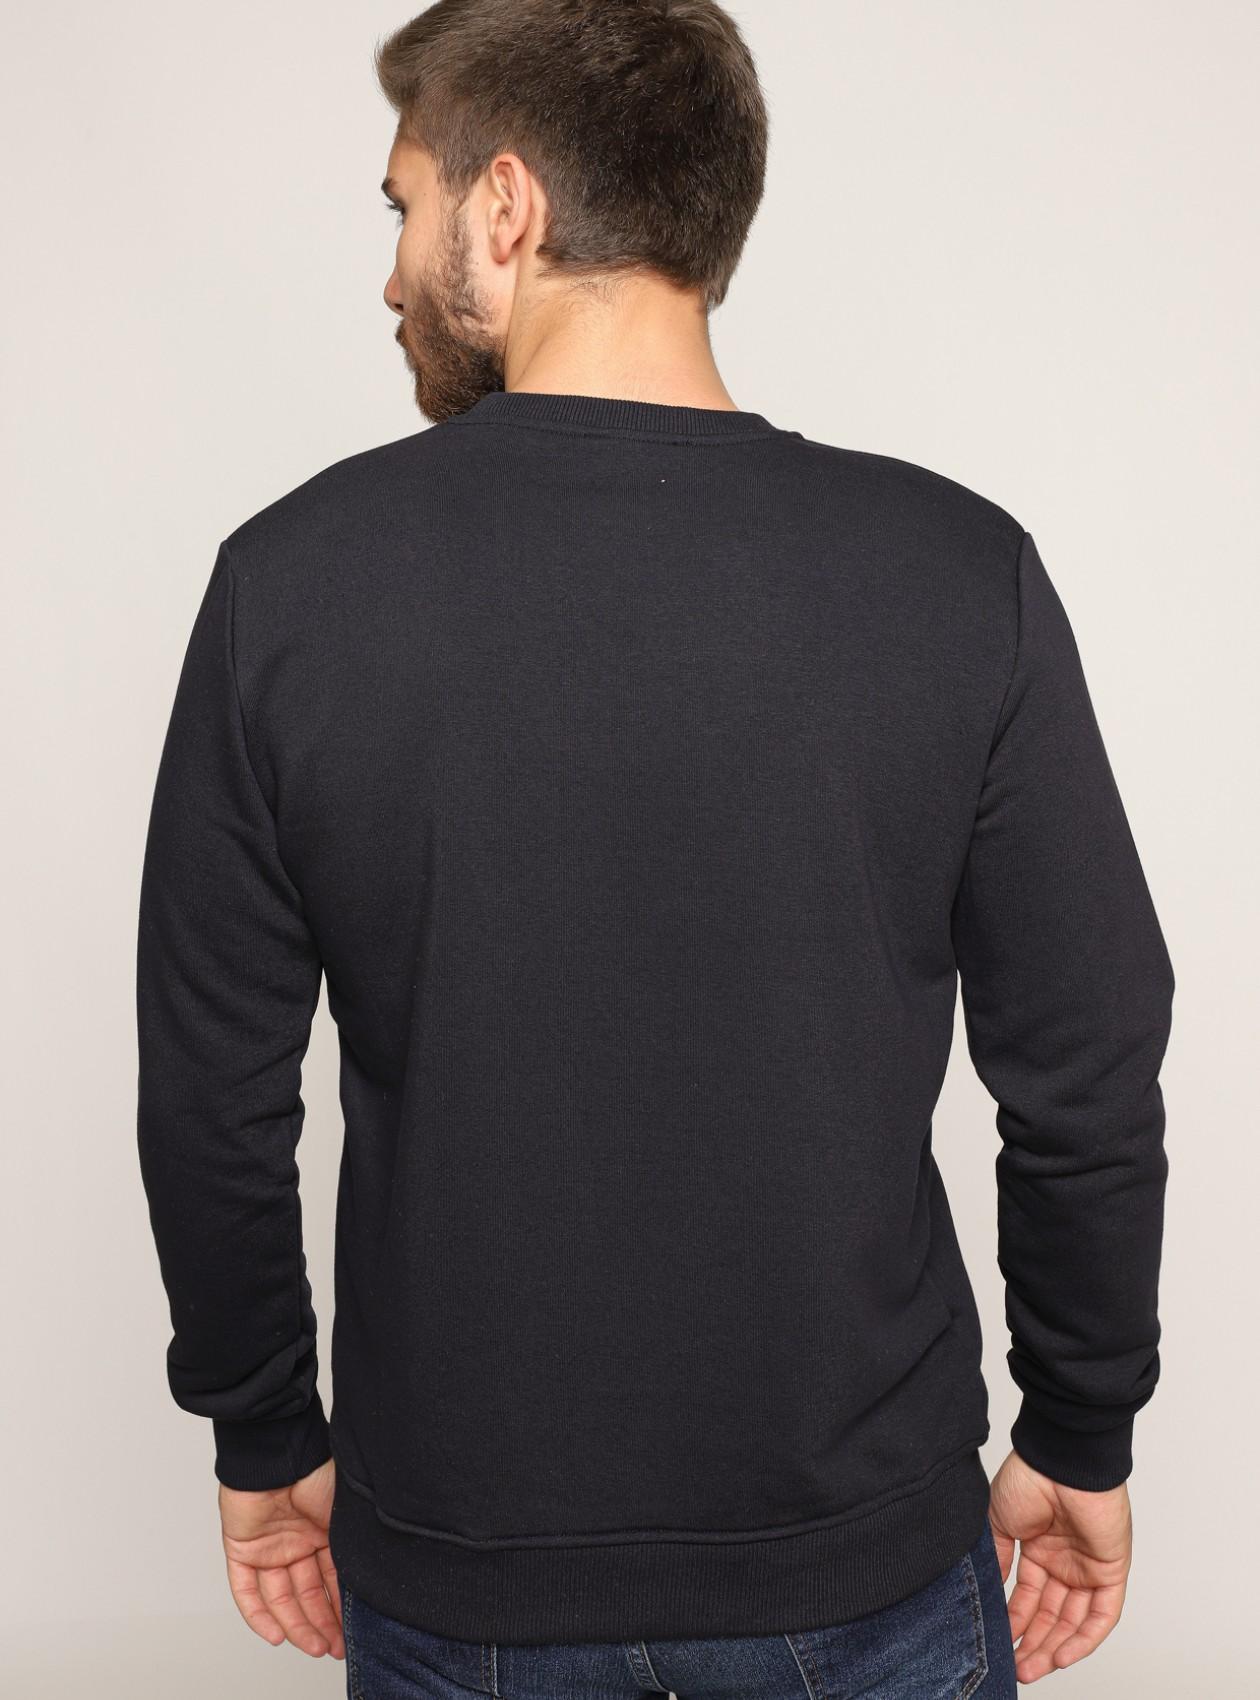 Original Sweatshirt Homme Marine